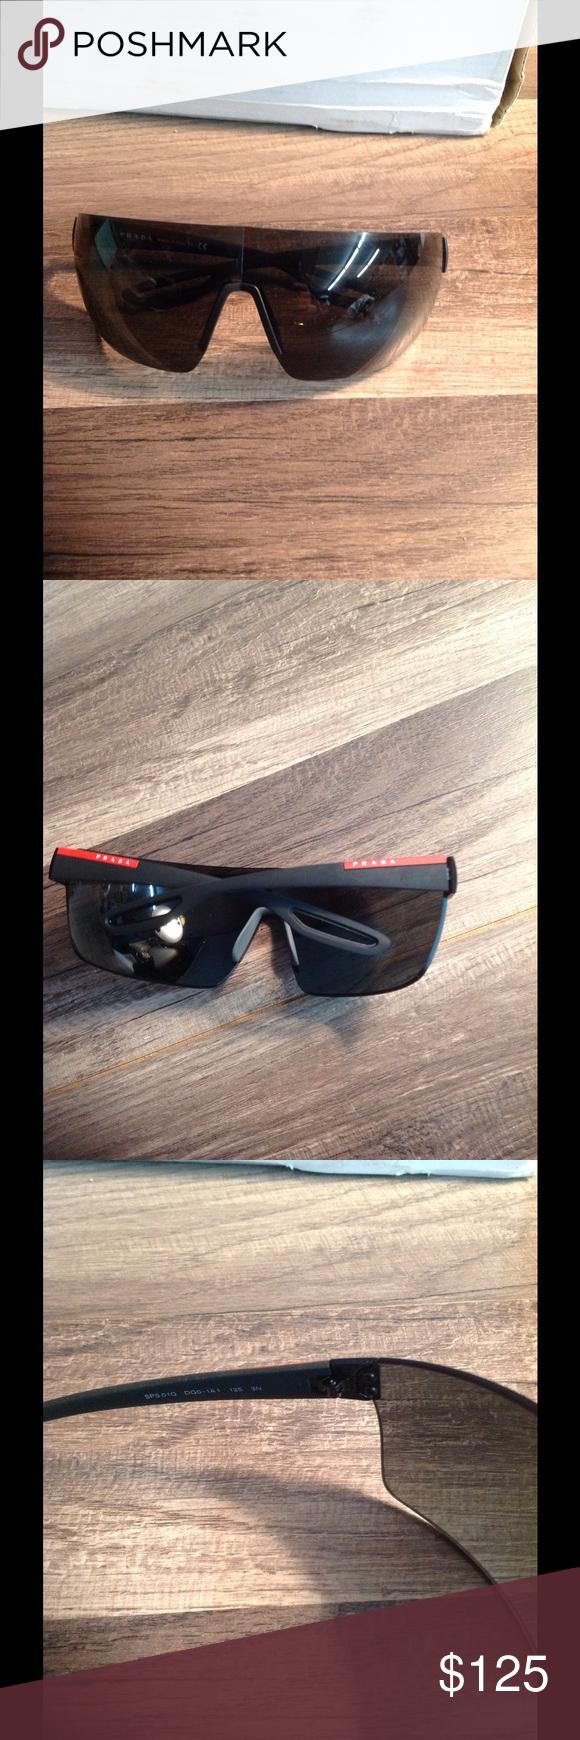 01441611f2a52 Prada full frame sunglasses authentic PRADA LINEA ROSSA - SPS 01Q SPORT  SHIELD MATTE BLACK SUNGLASSES MIRRORED VISOR in new condition Prada Linea  Rossa ...